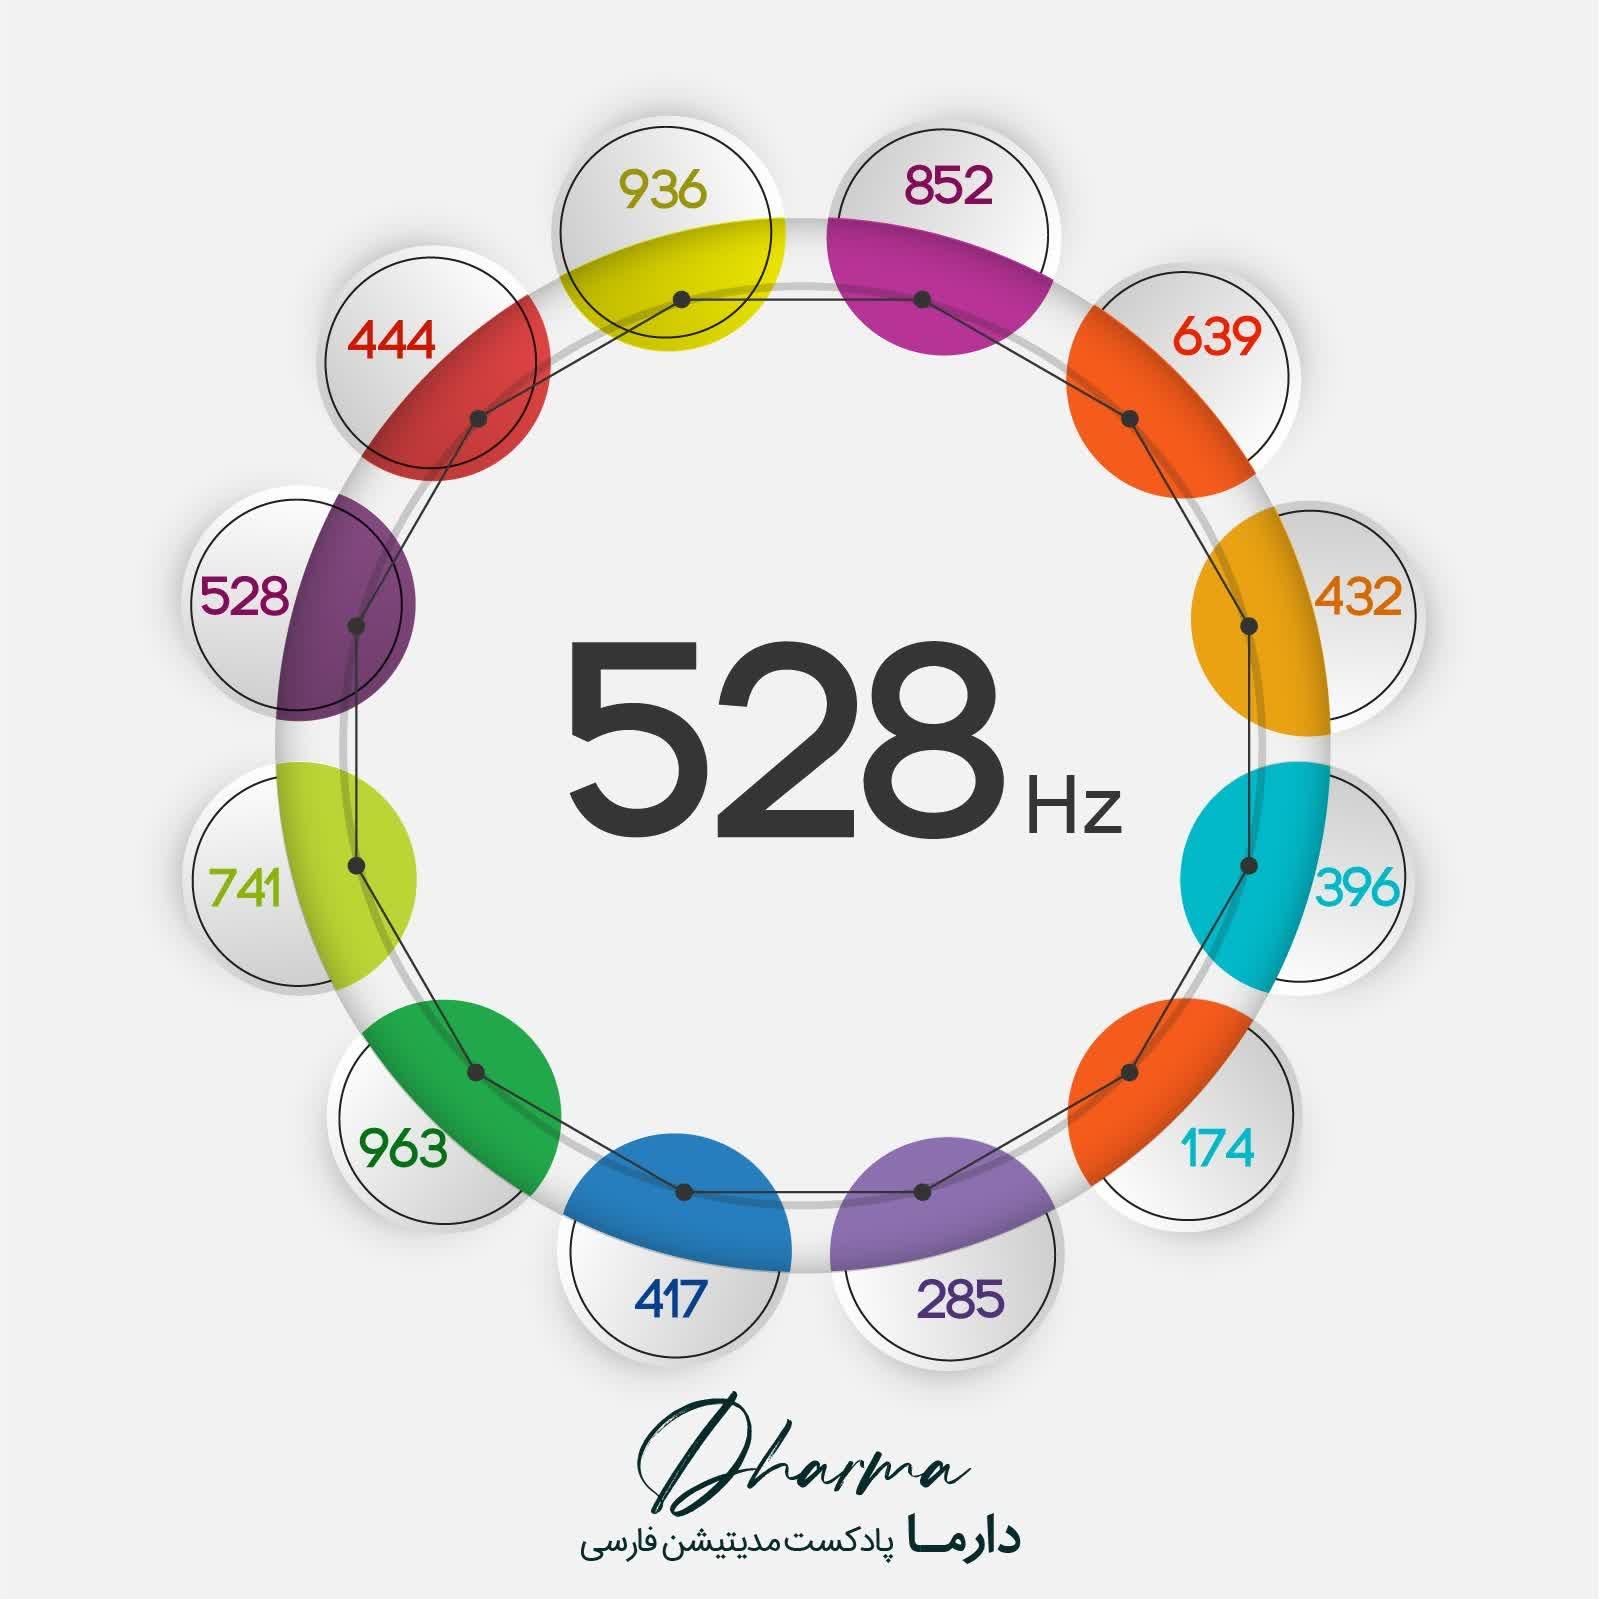 528Hz - فرکانس 528 هرتز